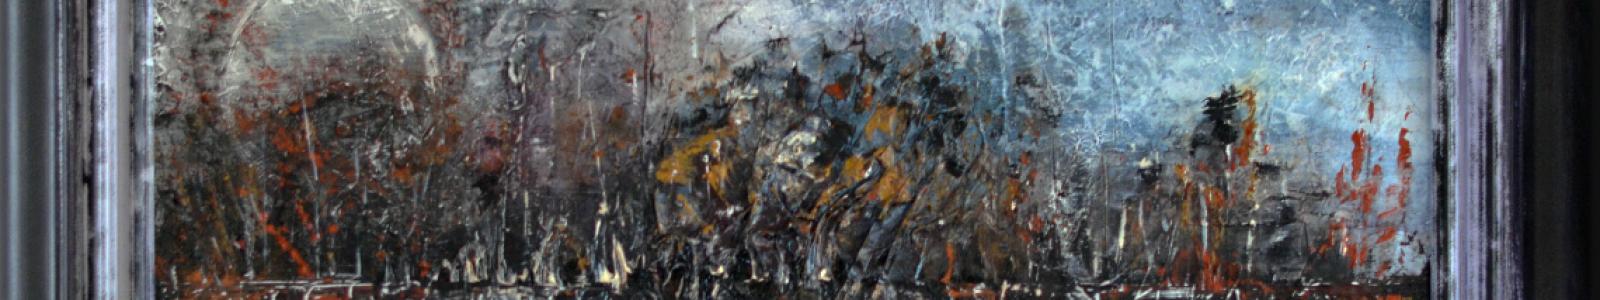 Galerie Peintre Nataly Fomina